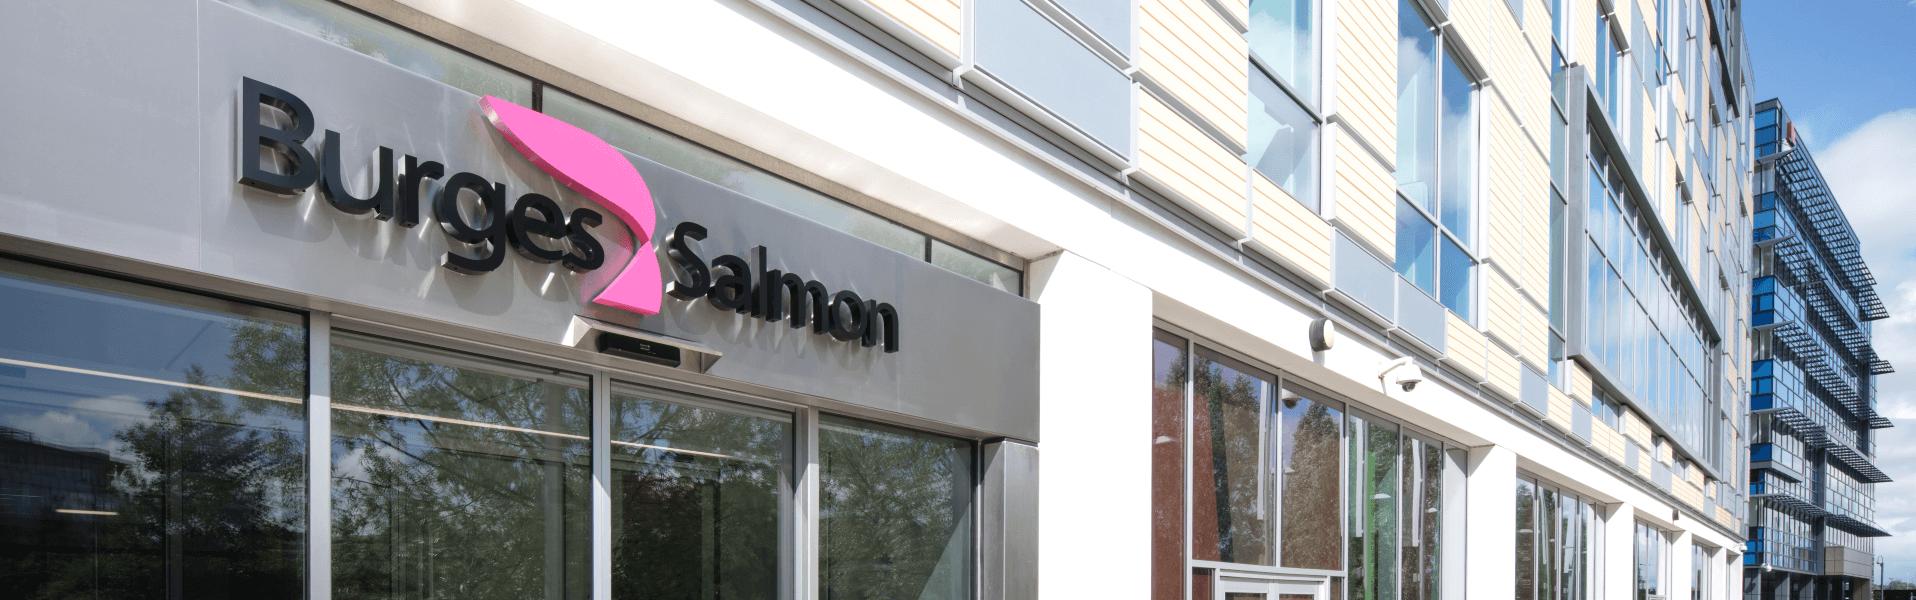 Burges Salmon Bristol office exterior